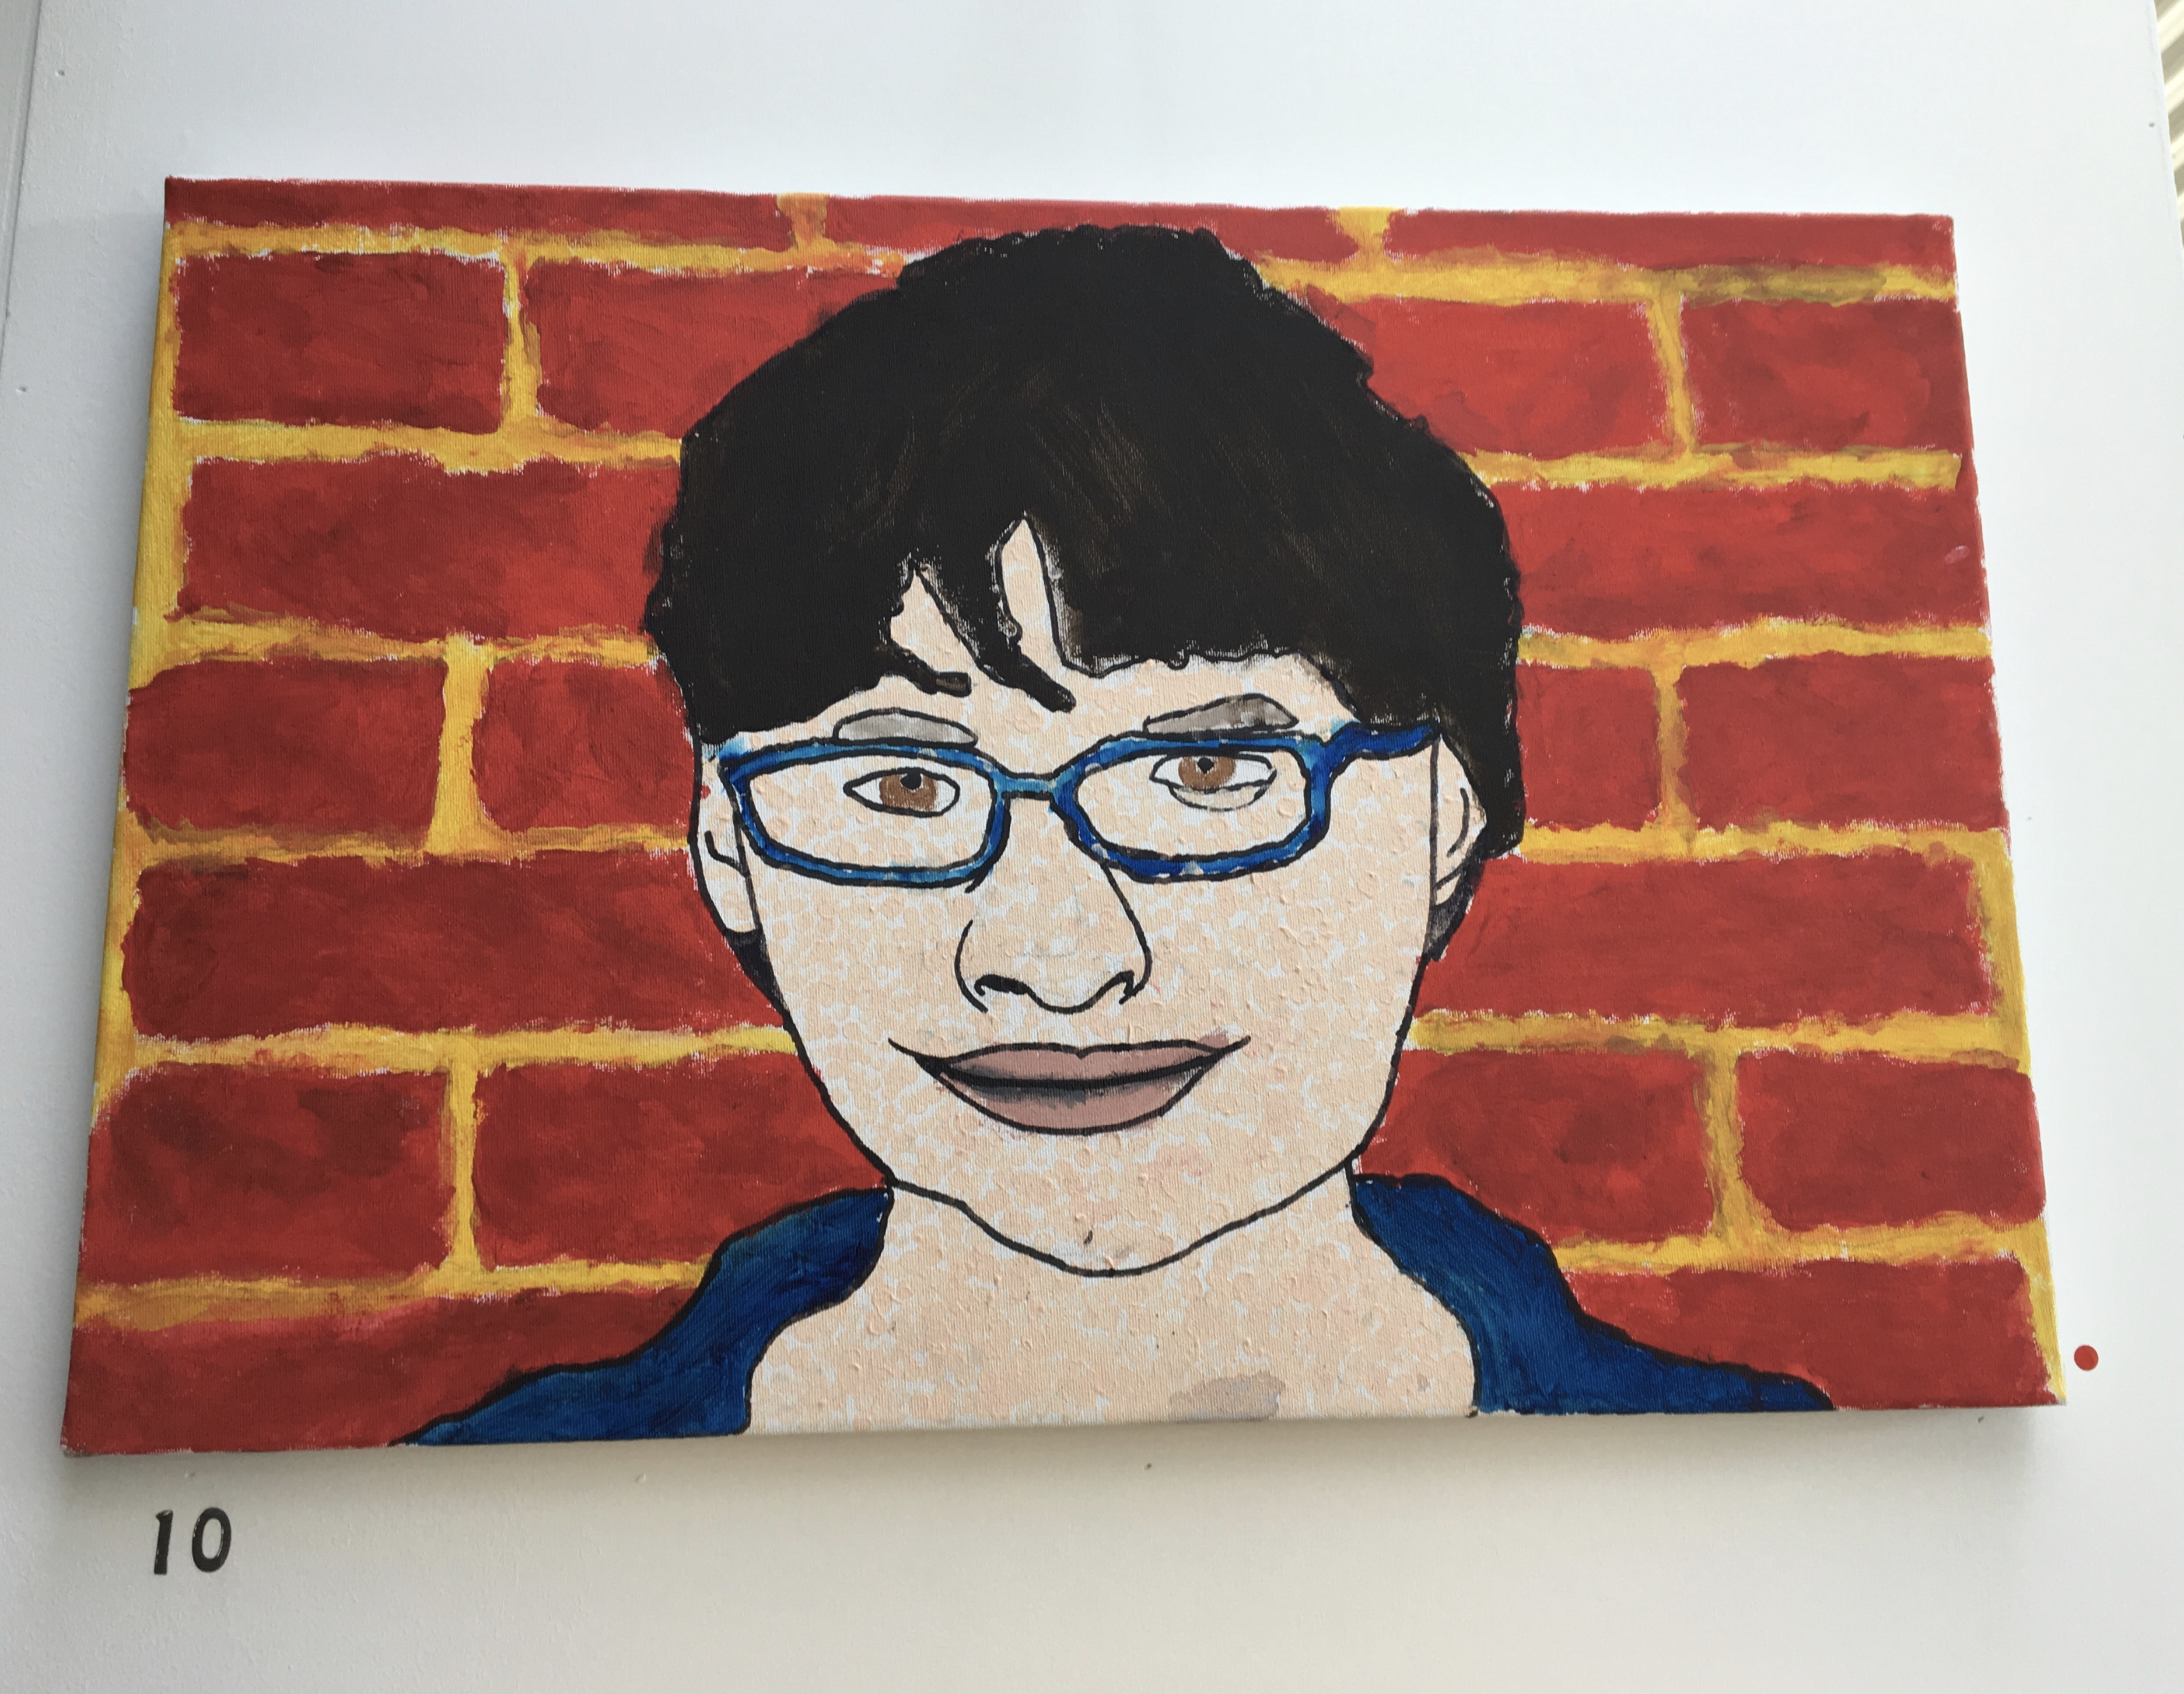 10.SElf Portrait, Tom Coomber, 40 x 60 x 2, £36, SOLD